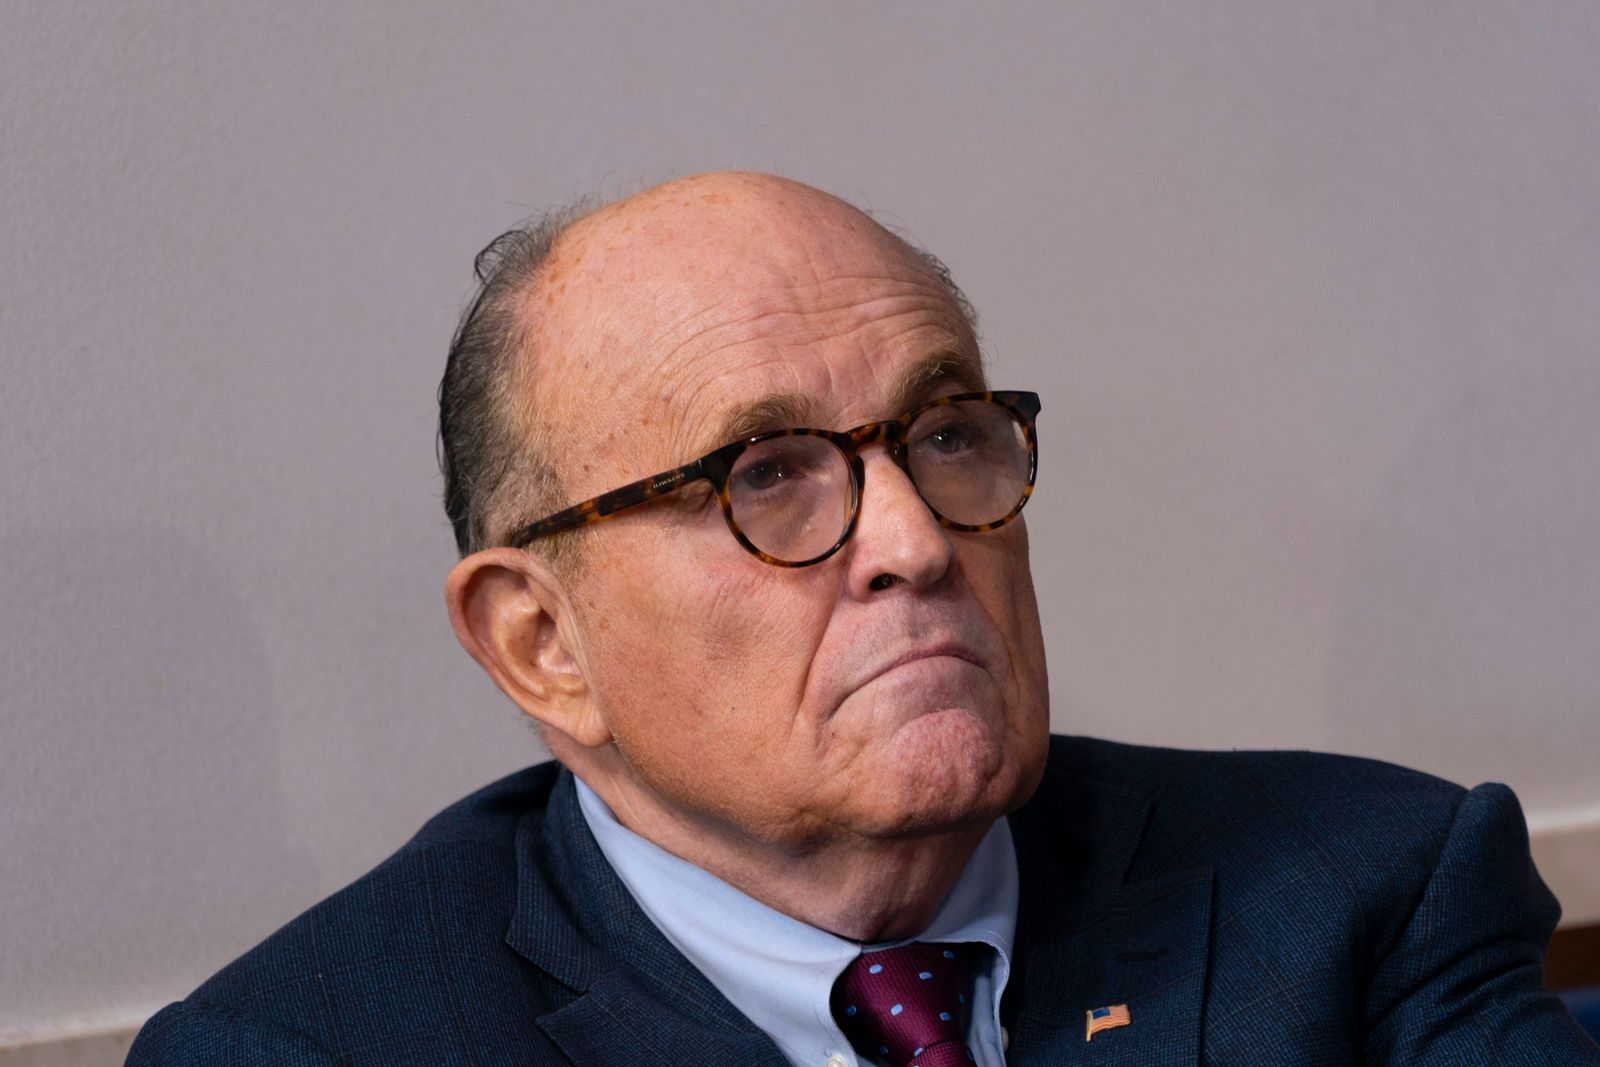 September 27, 2020, Washington, District of Columbia, USA: Former Mayor Rudy Giuliani (Republican of New York, New York